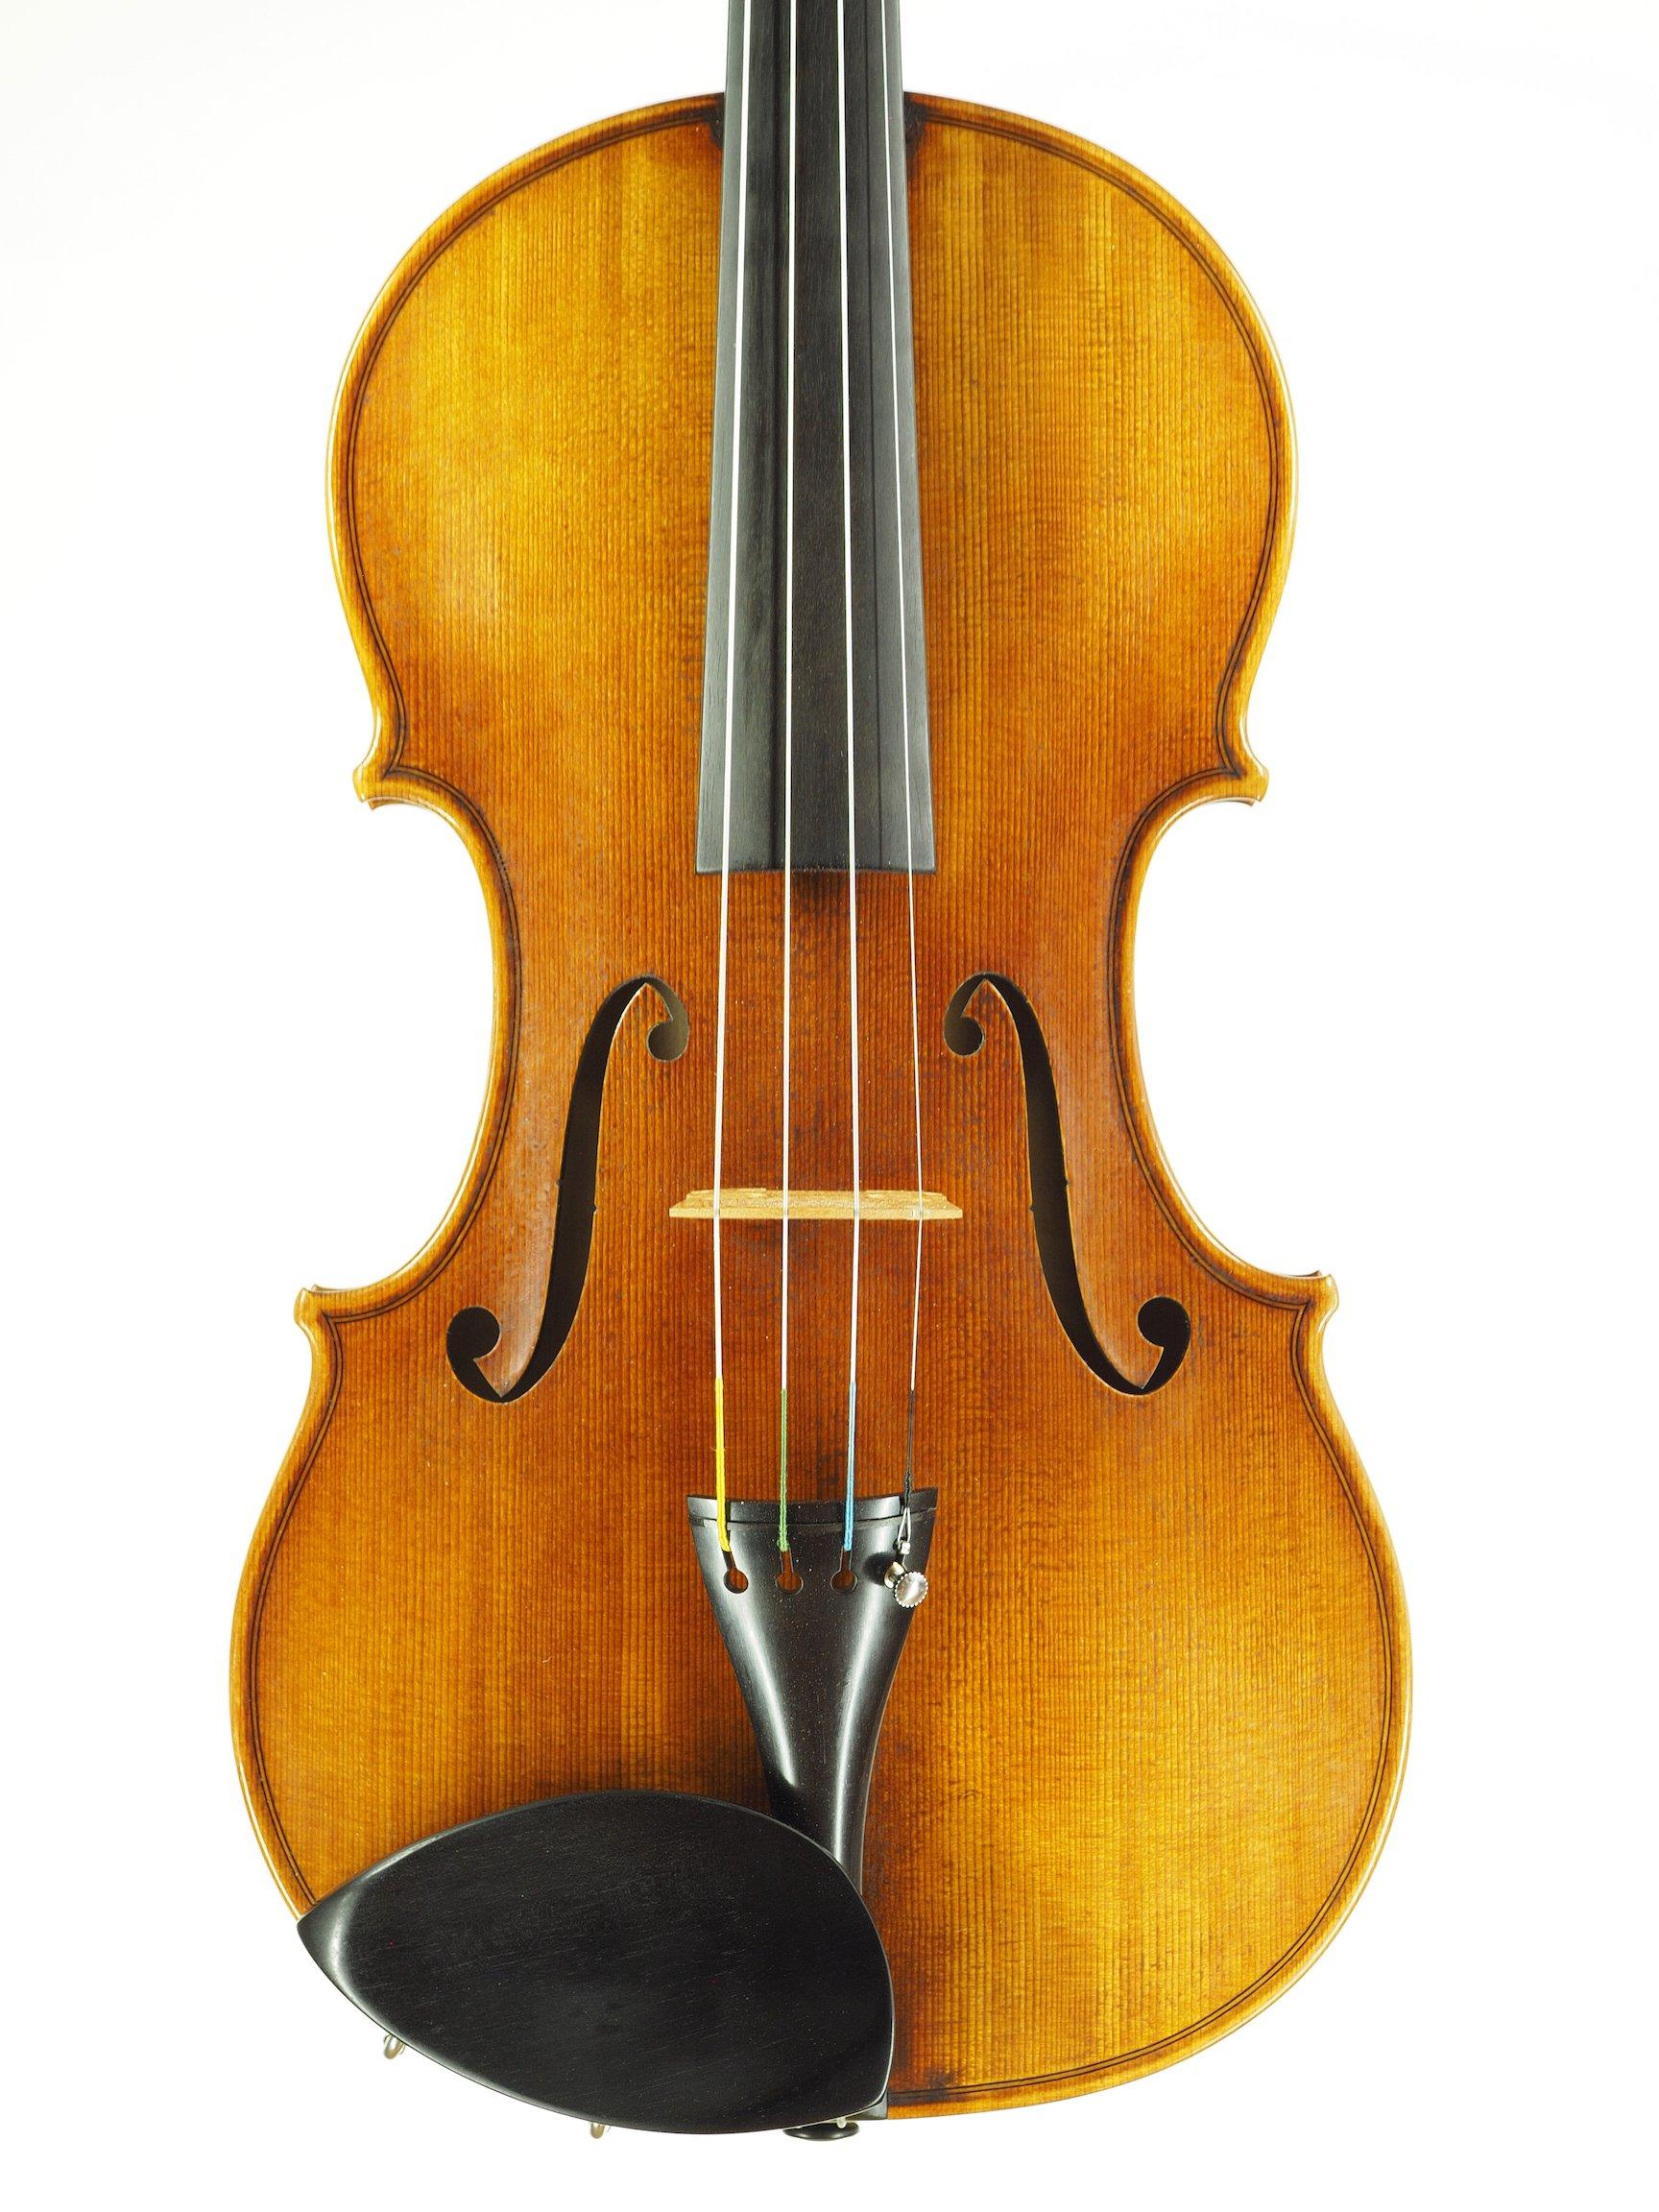 Violin based on the model of the 'Sauret' Guarneri del Gesu anno 1743 VI